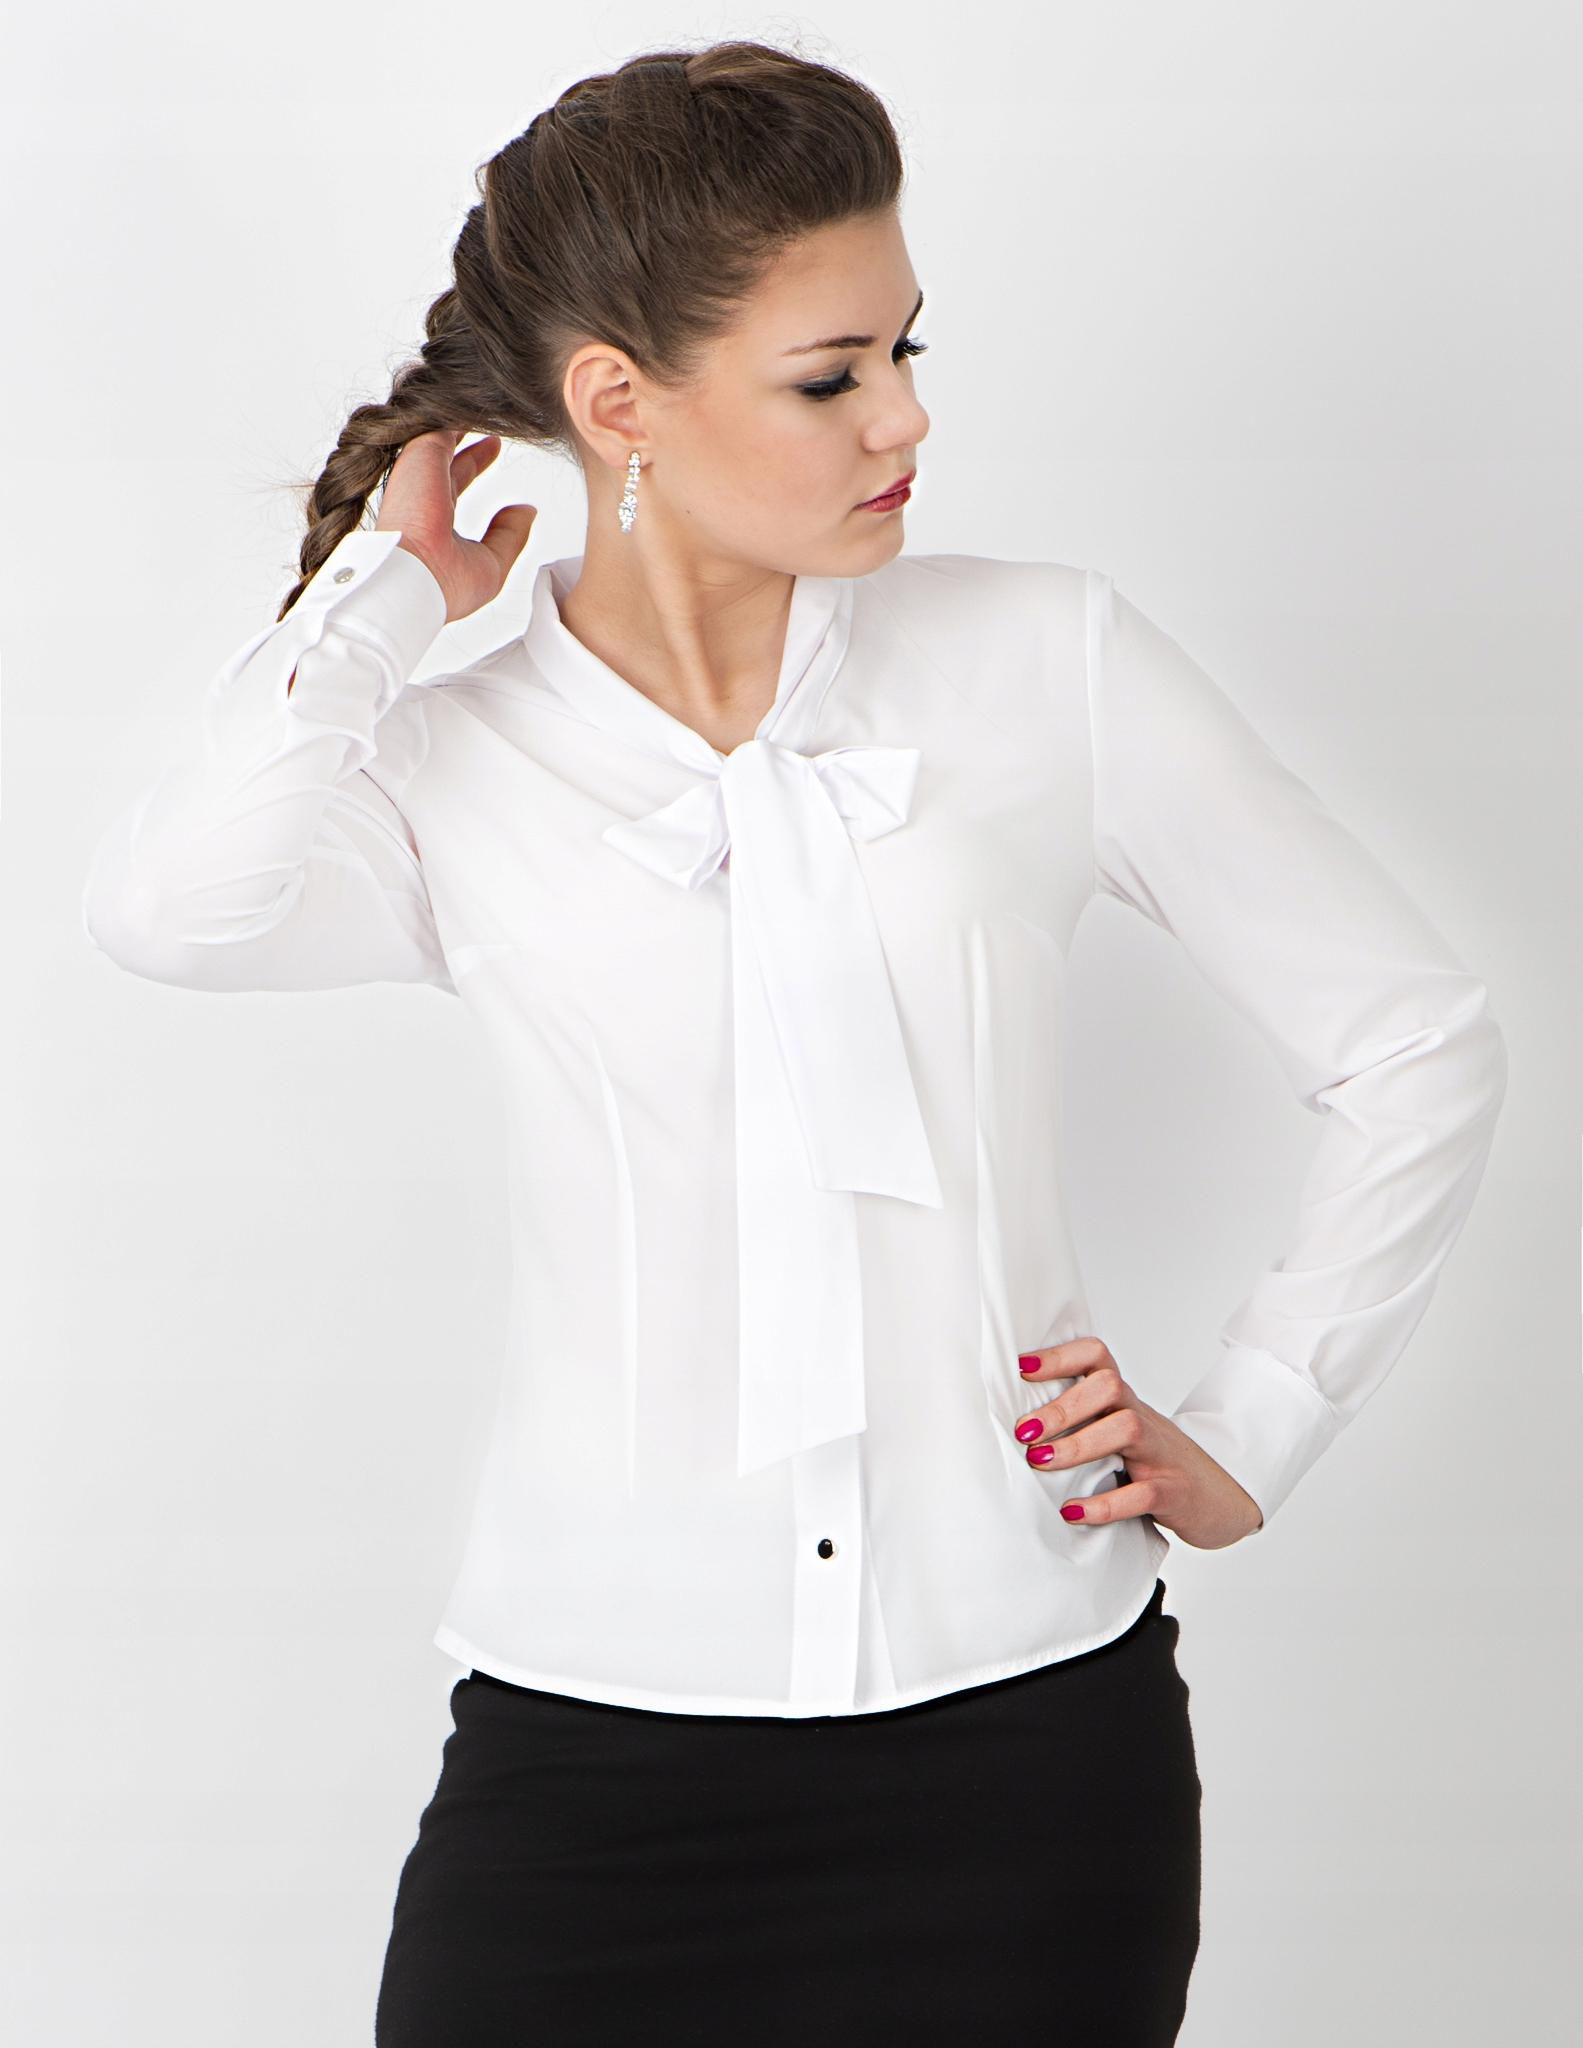 0eadf93b3723e Moira damska koszula biała z krawatem, kokardą 44 - 7256850712 ...